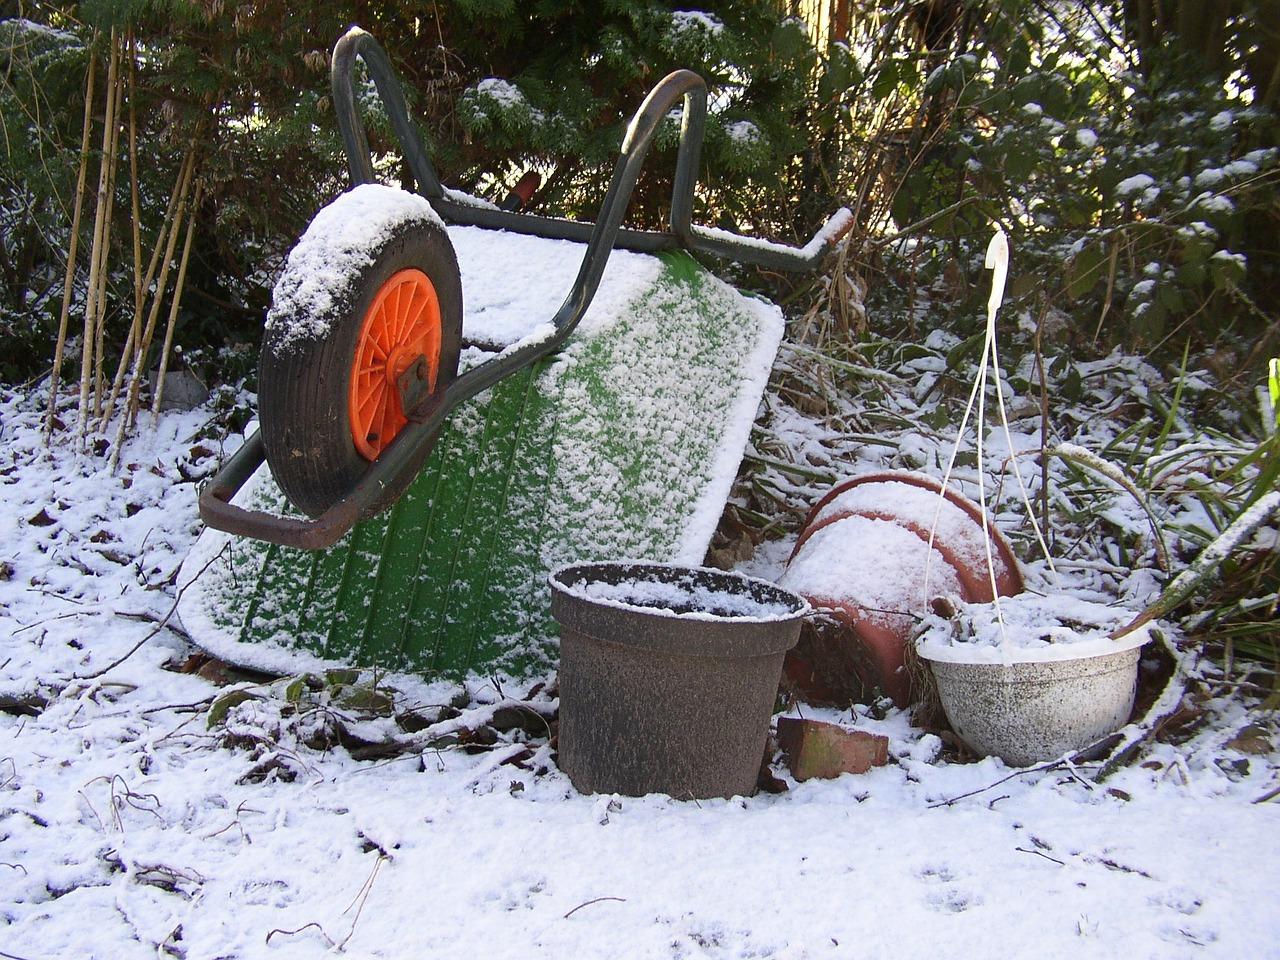 bark mulch suppliers cambridge monthly garden jobs wheelbarrow 421368 1280